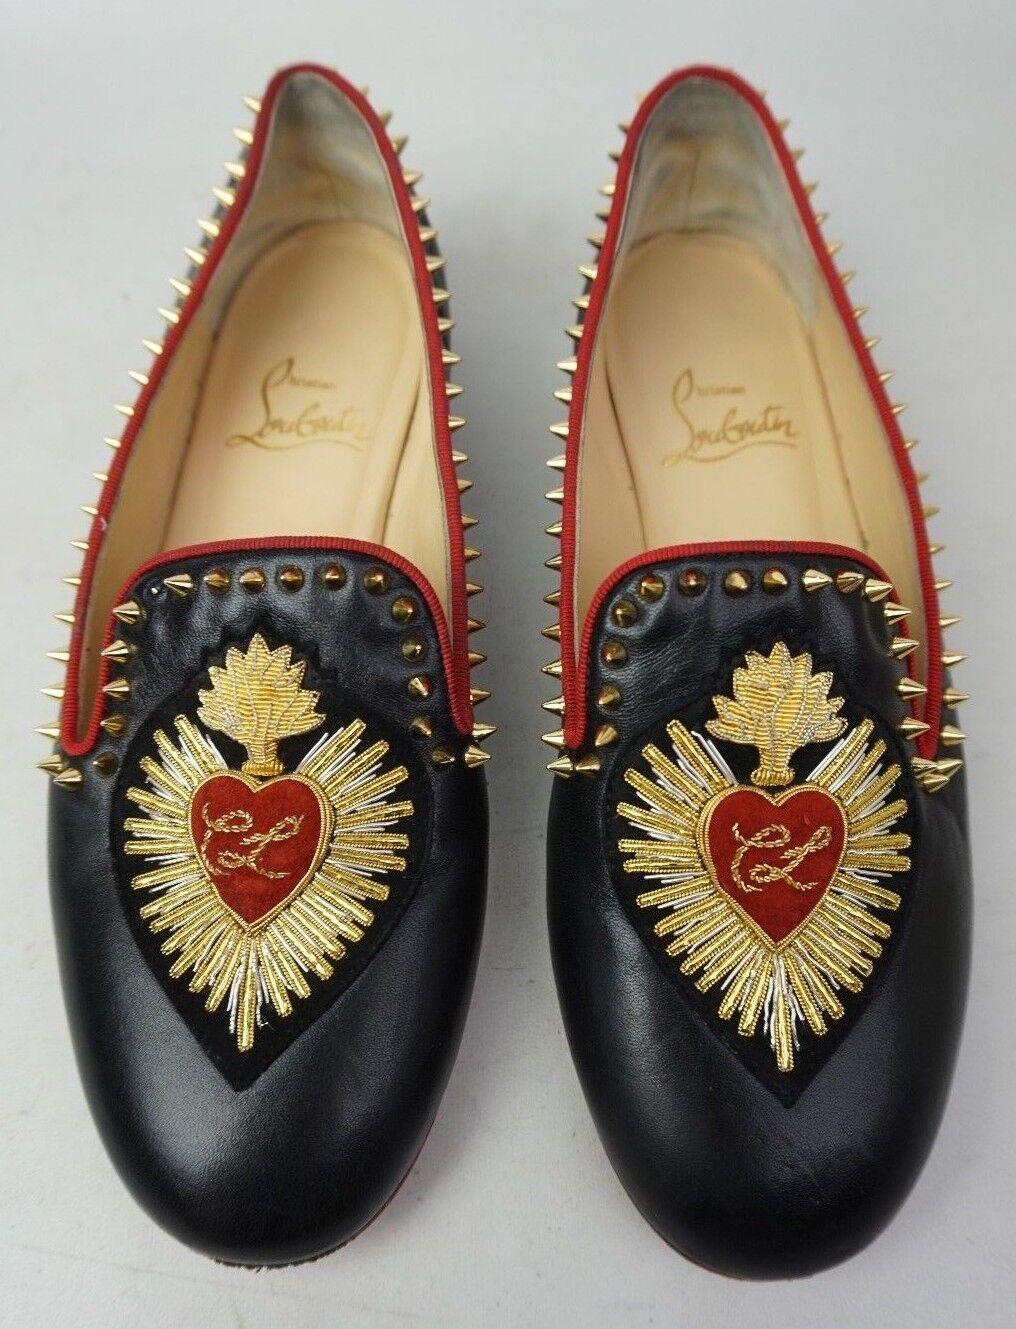 Christian Louboutin Mi Corazon Spiked Flat Flat Flat Black Leather Loafers Women's Size 35 c1569d